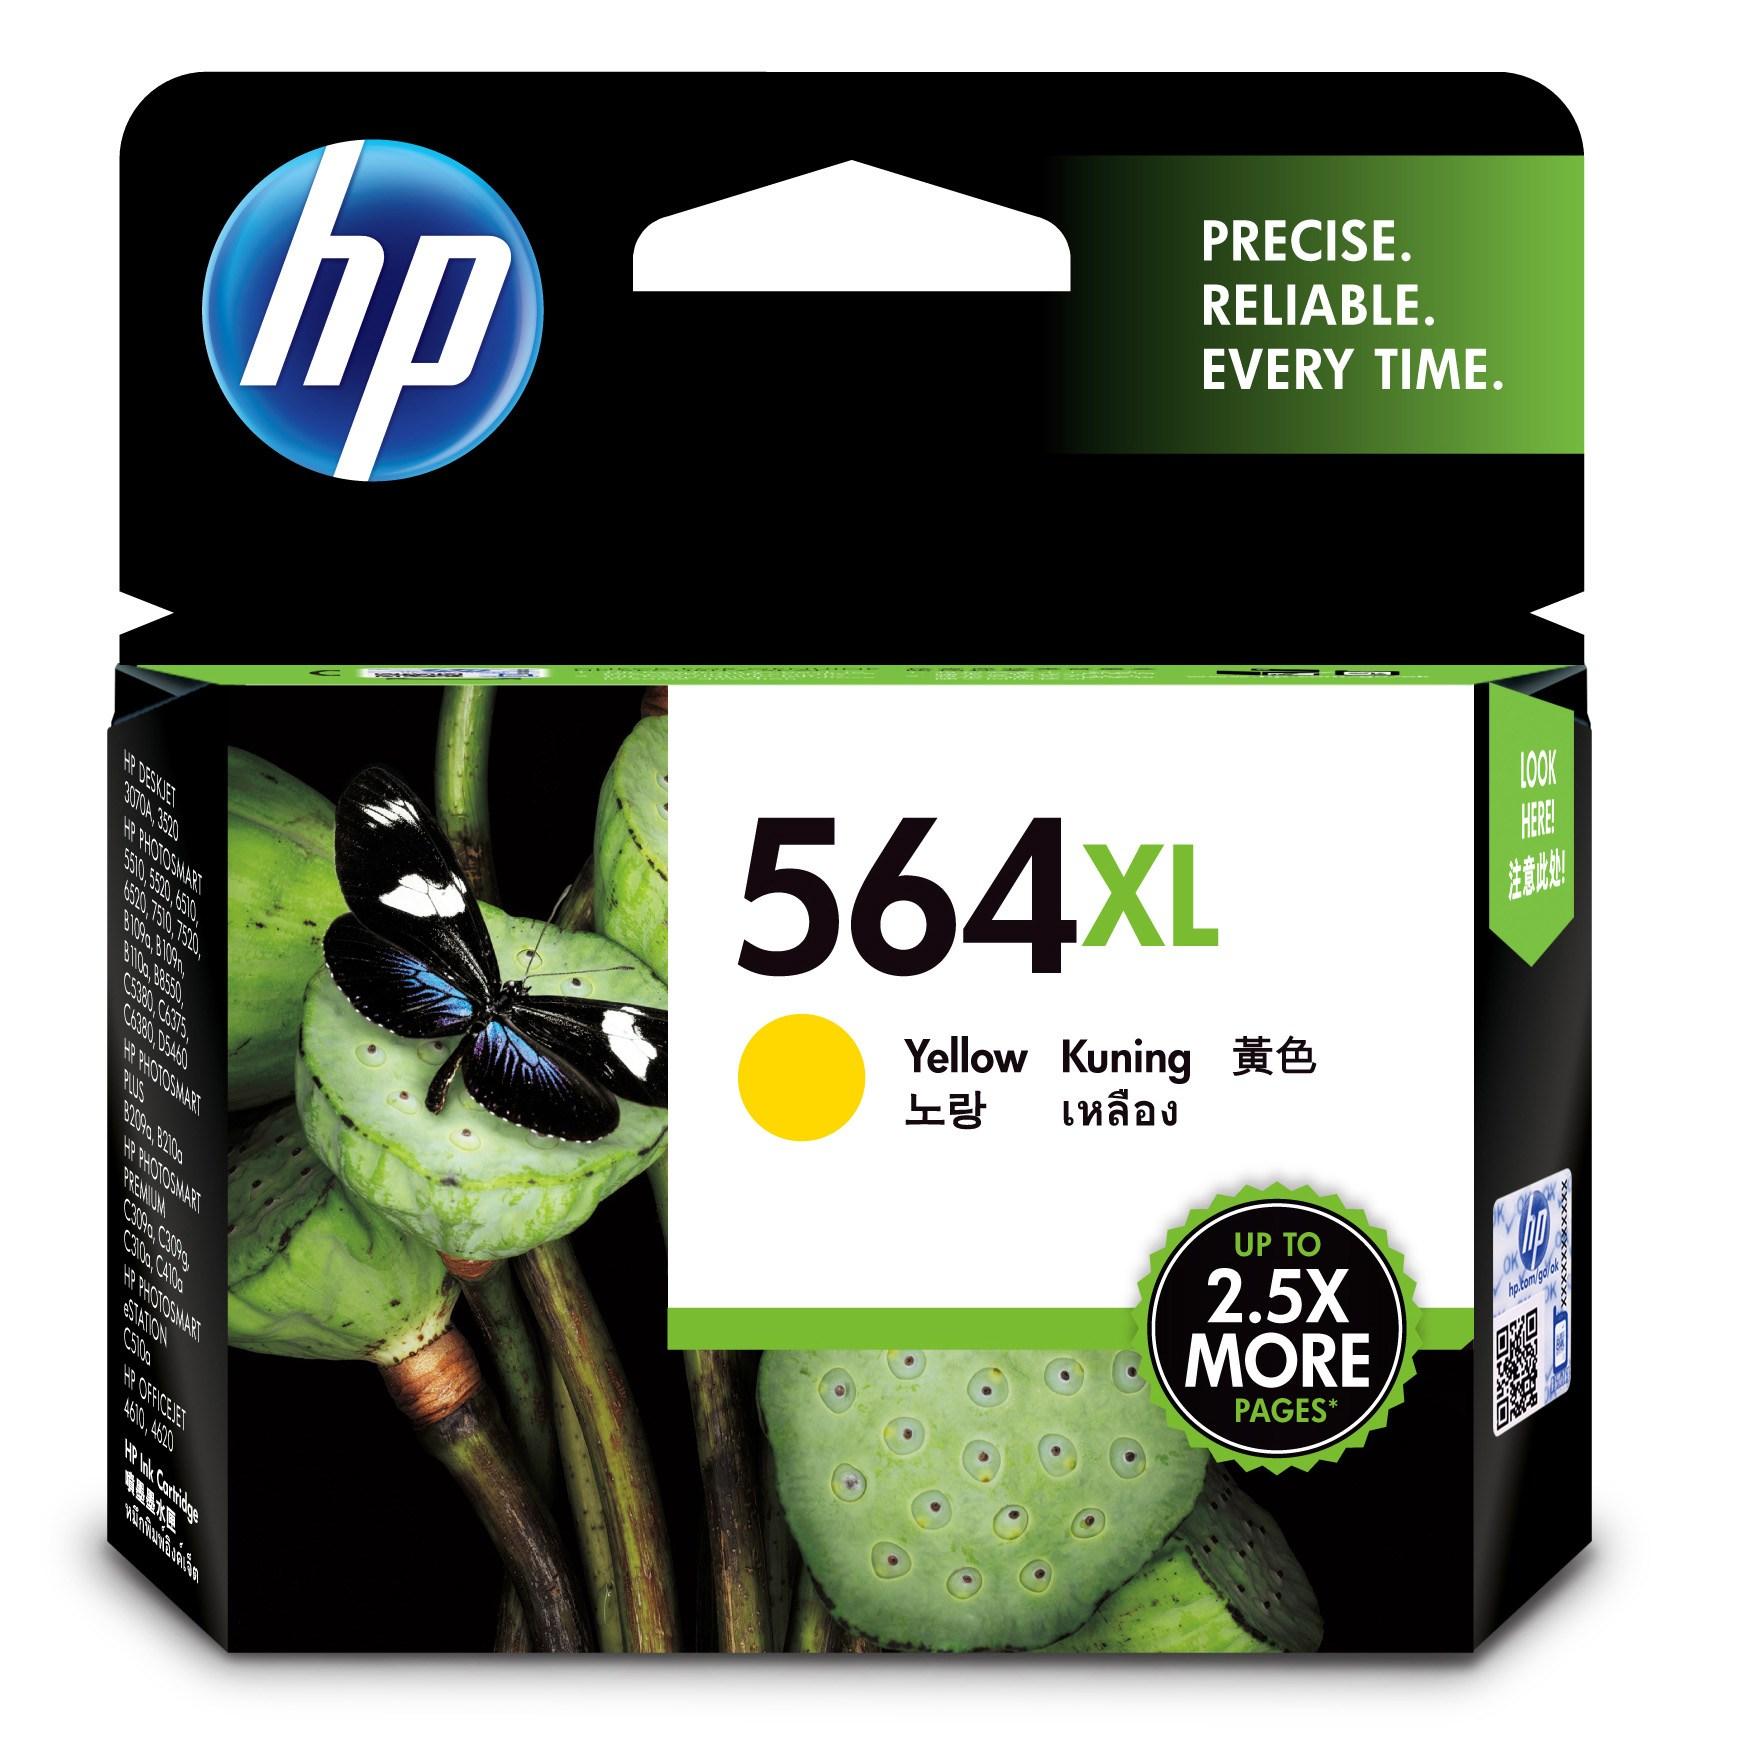 Mực in phun màu vàng hiệu suất cao HP 564XL (CB325WA)